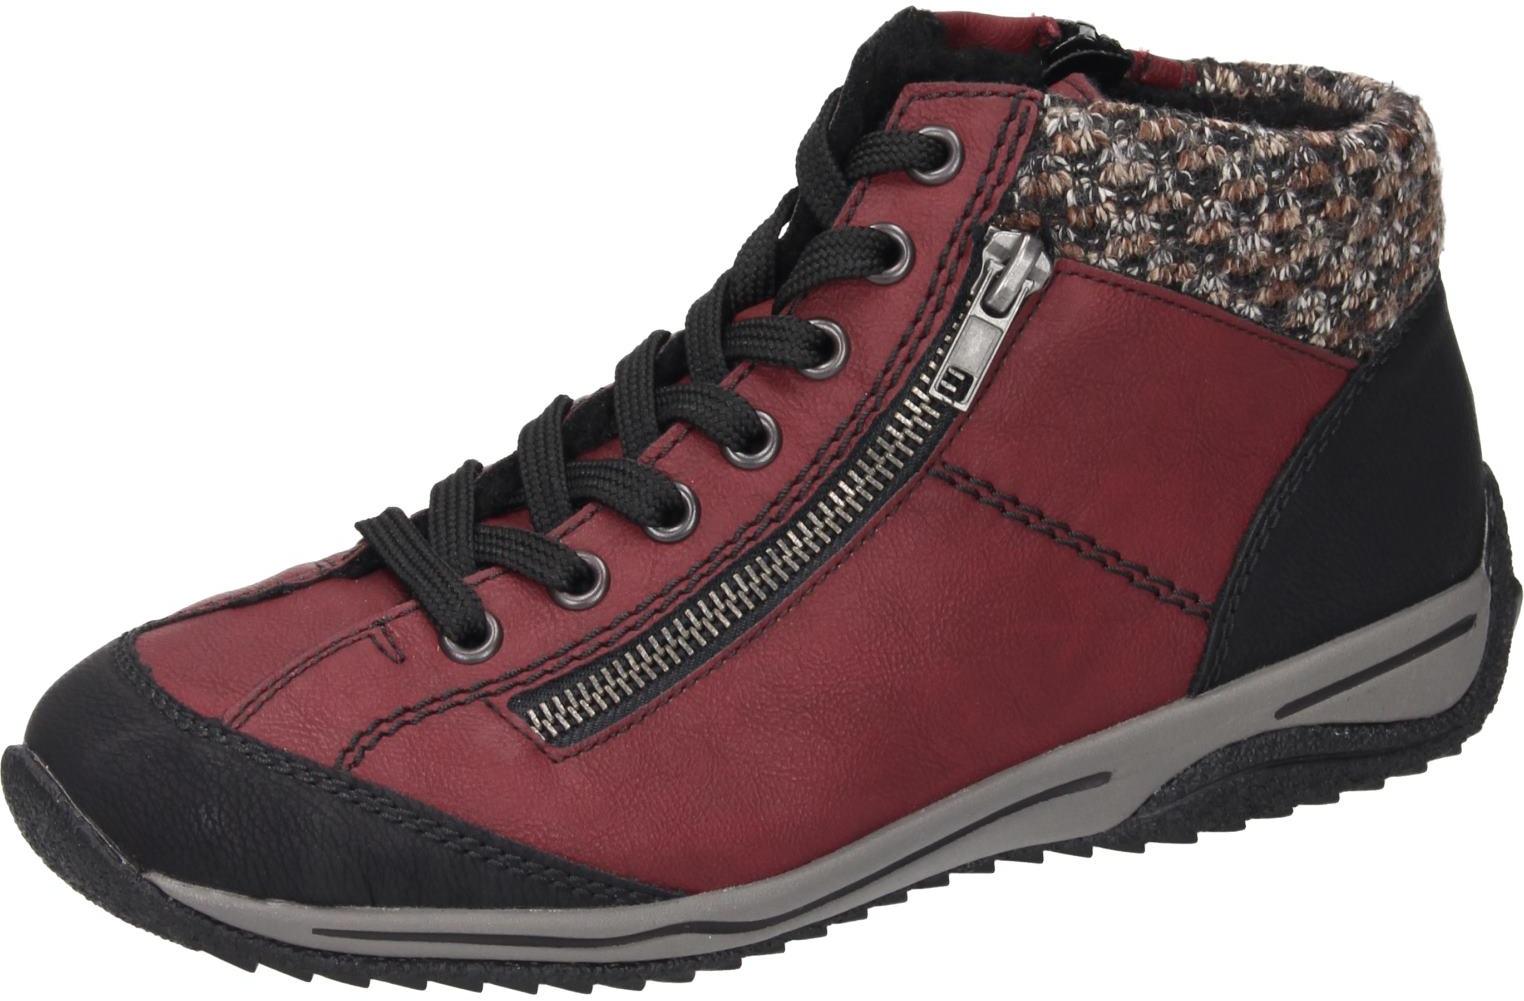 Schuhe Zu Synthetik Damen Details Rot Rieker Stiefel clK1FJ